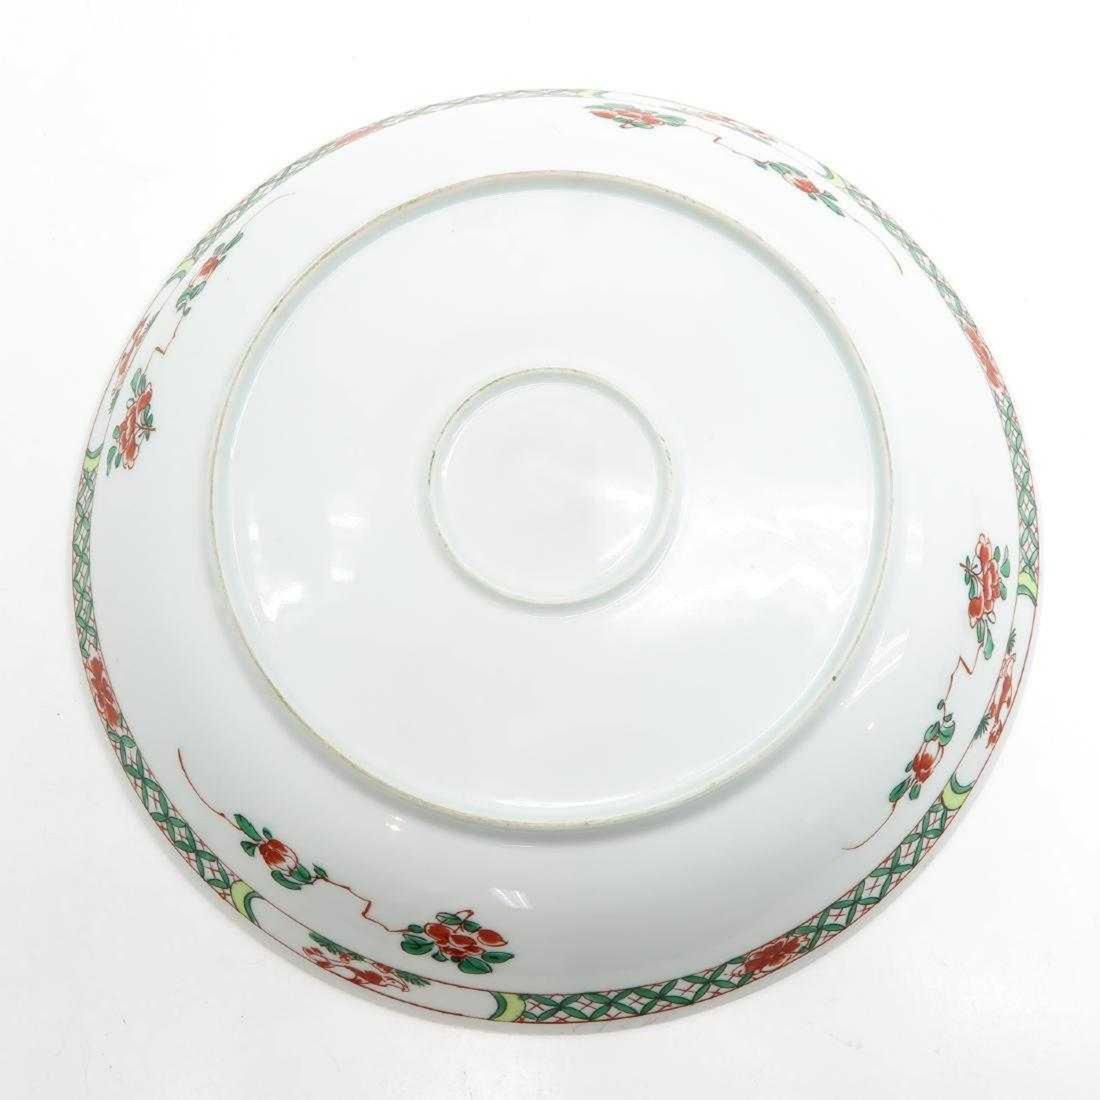 Polychrome Decor Porcelain Plate - 2